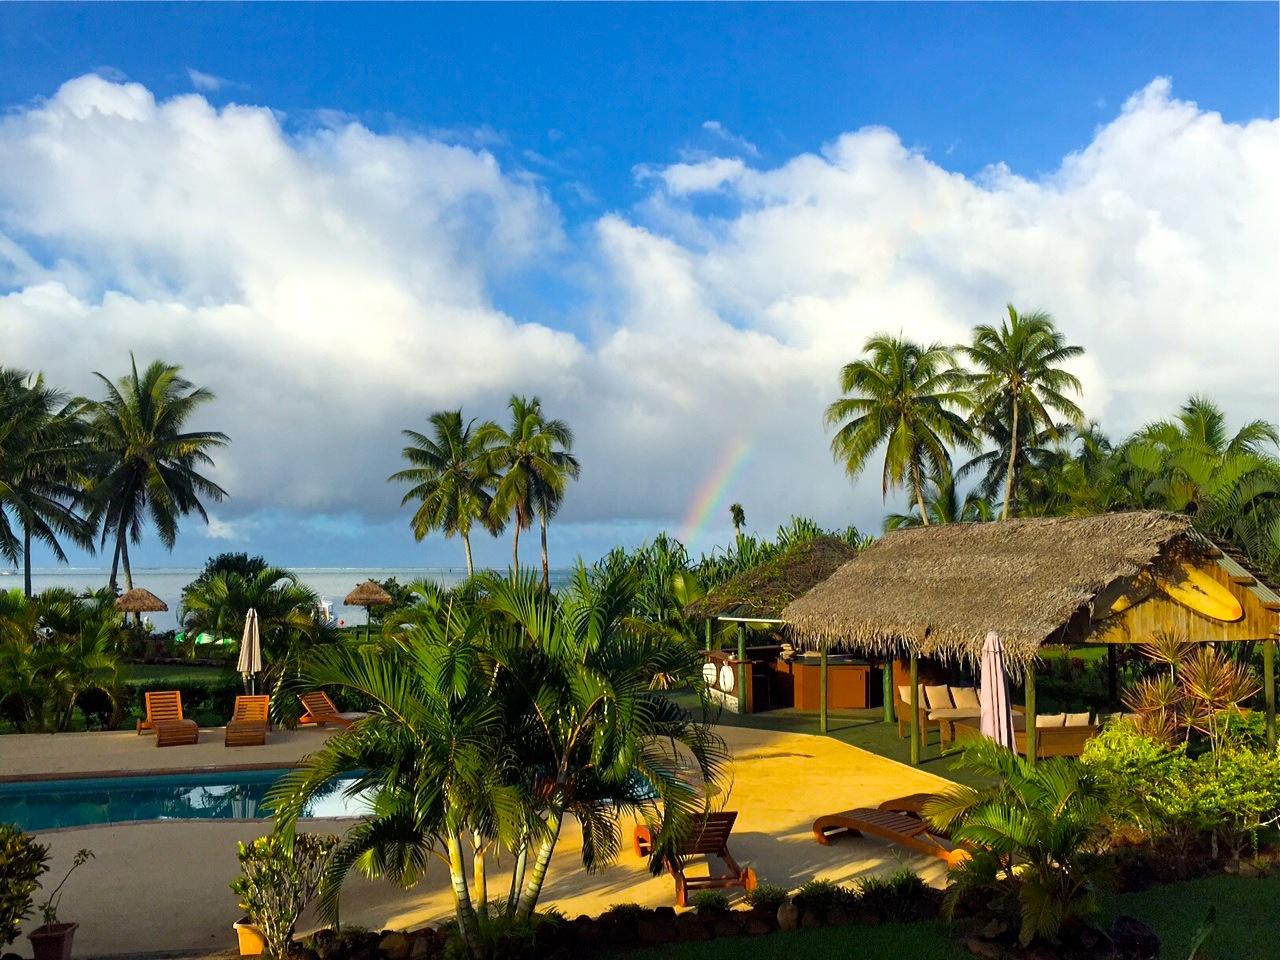 Waidroka Bay Resort in Viti Levu